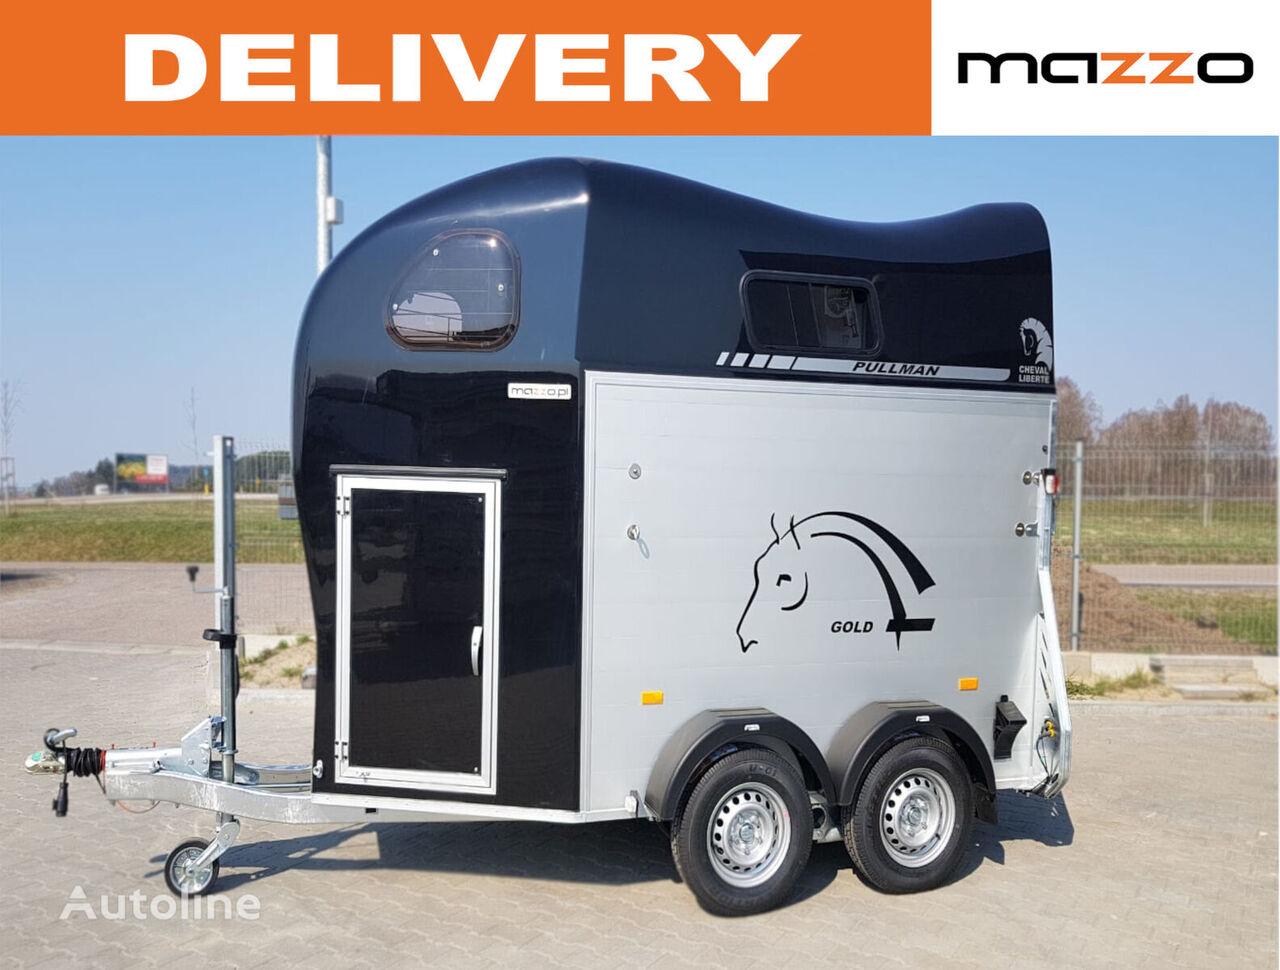 remolque de caballos Cheval liberte Gold II - two horses trailer nuevo